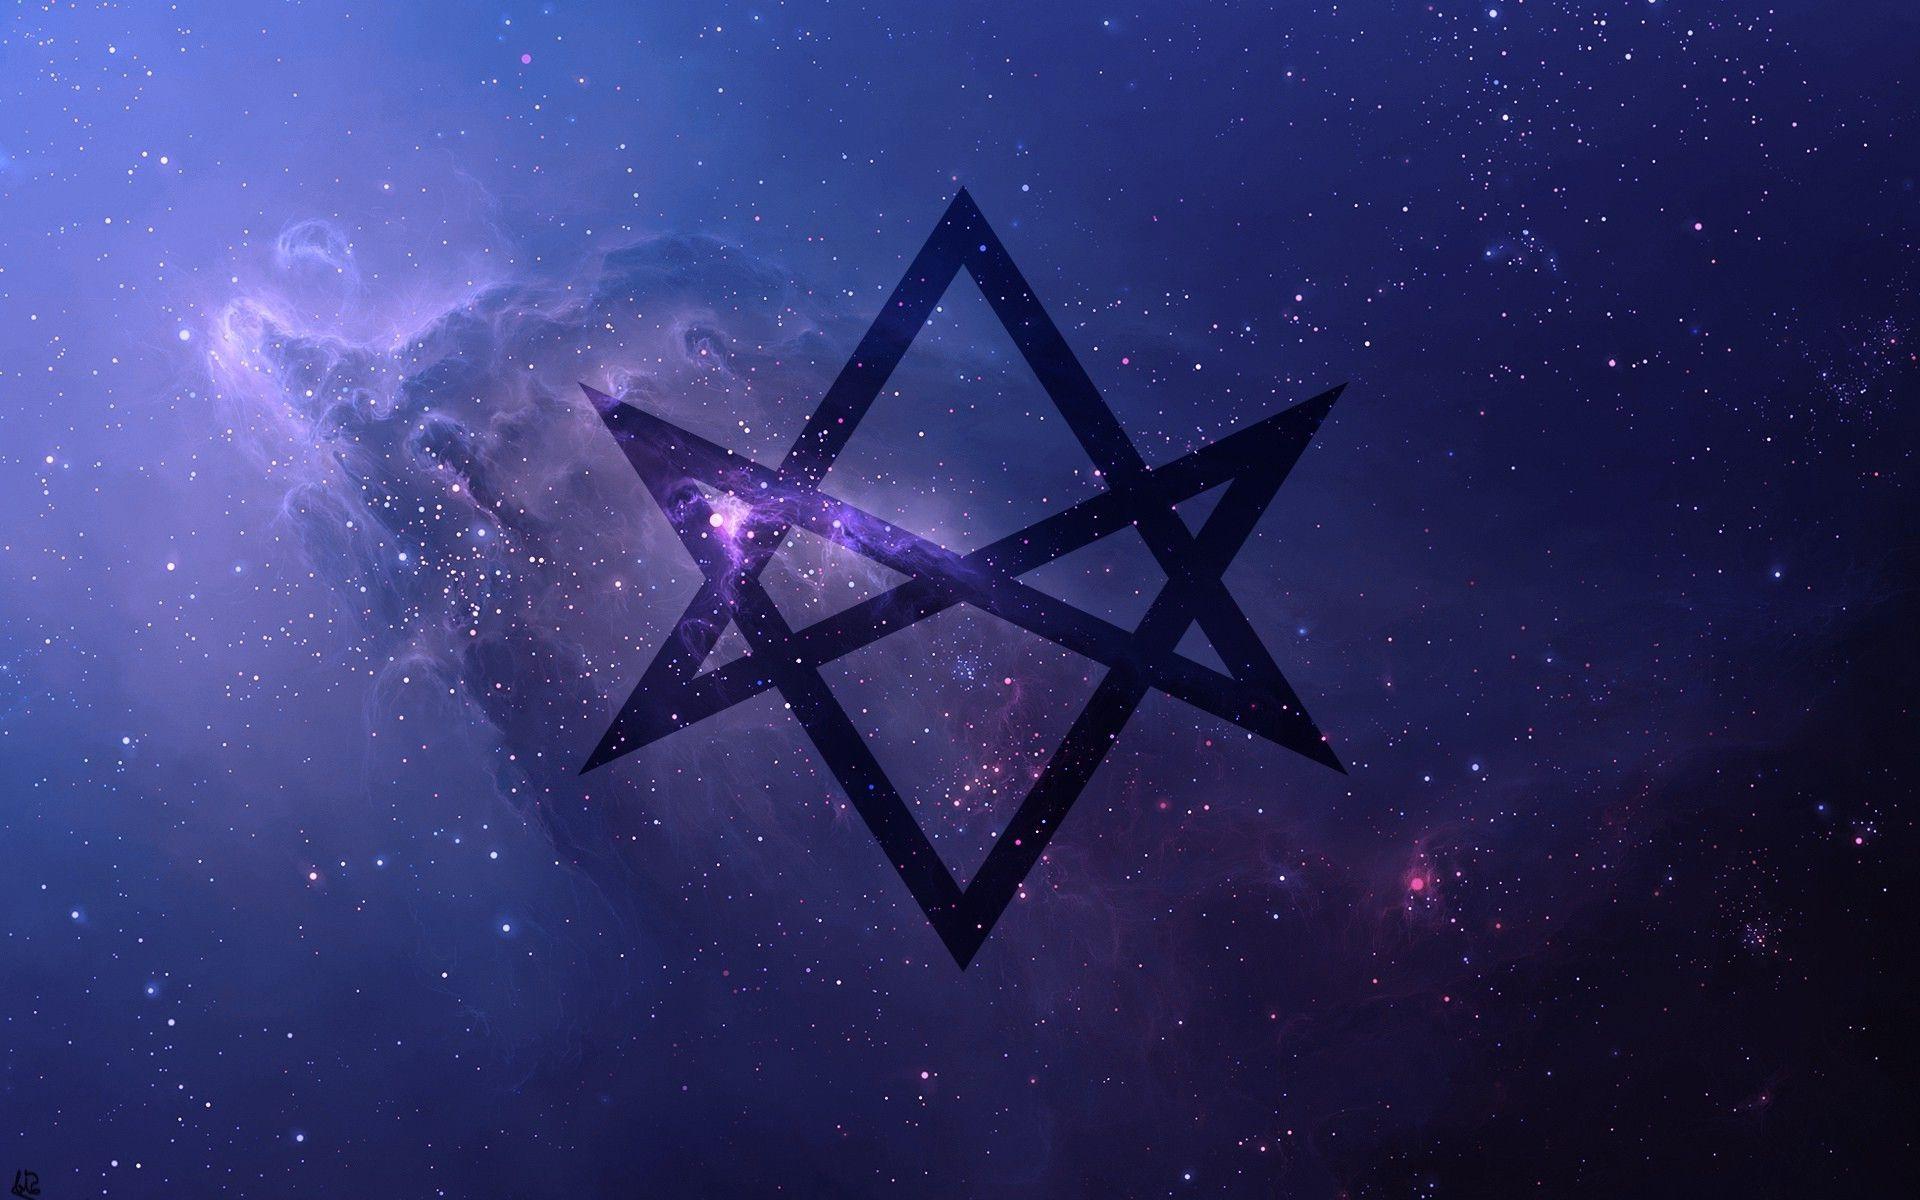 thelema, Unicursal Hexagram, Space, Universe, Purple